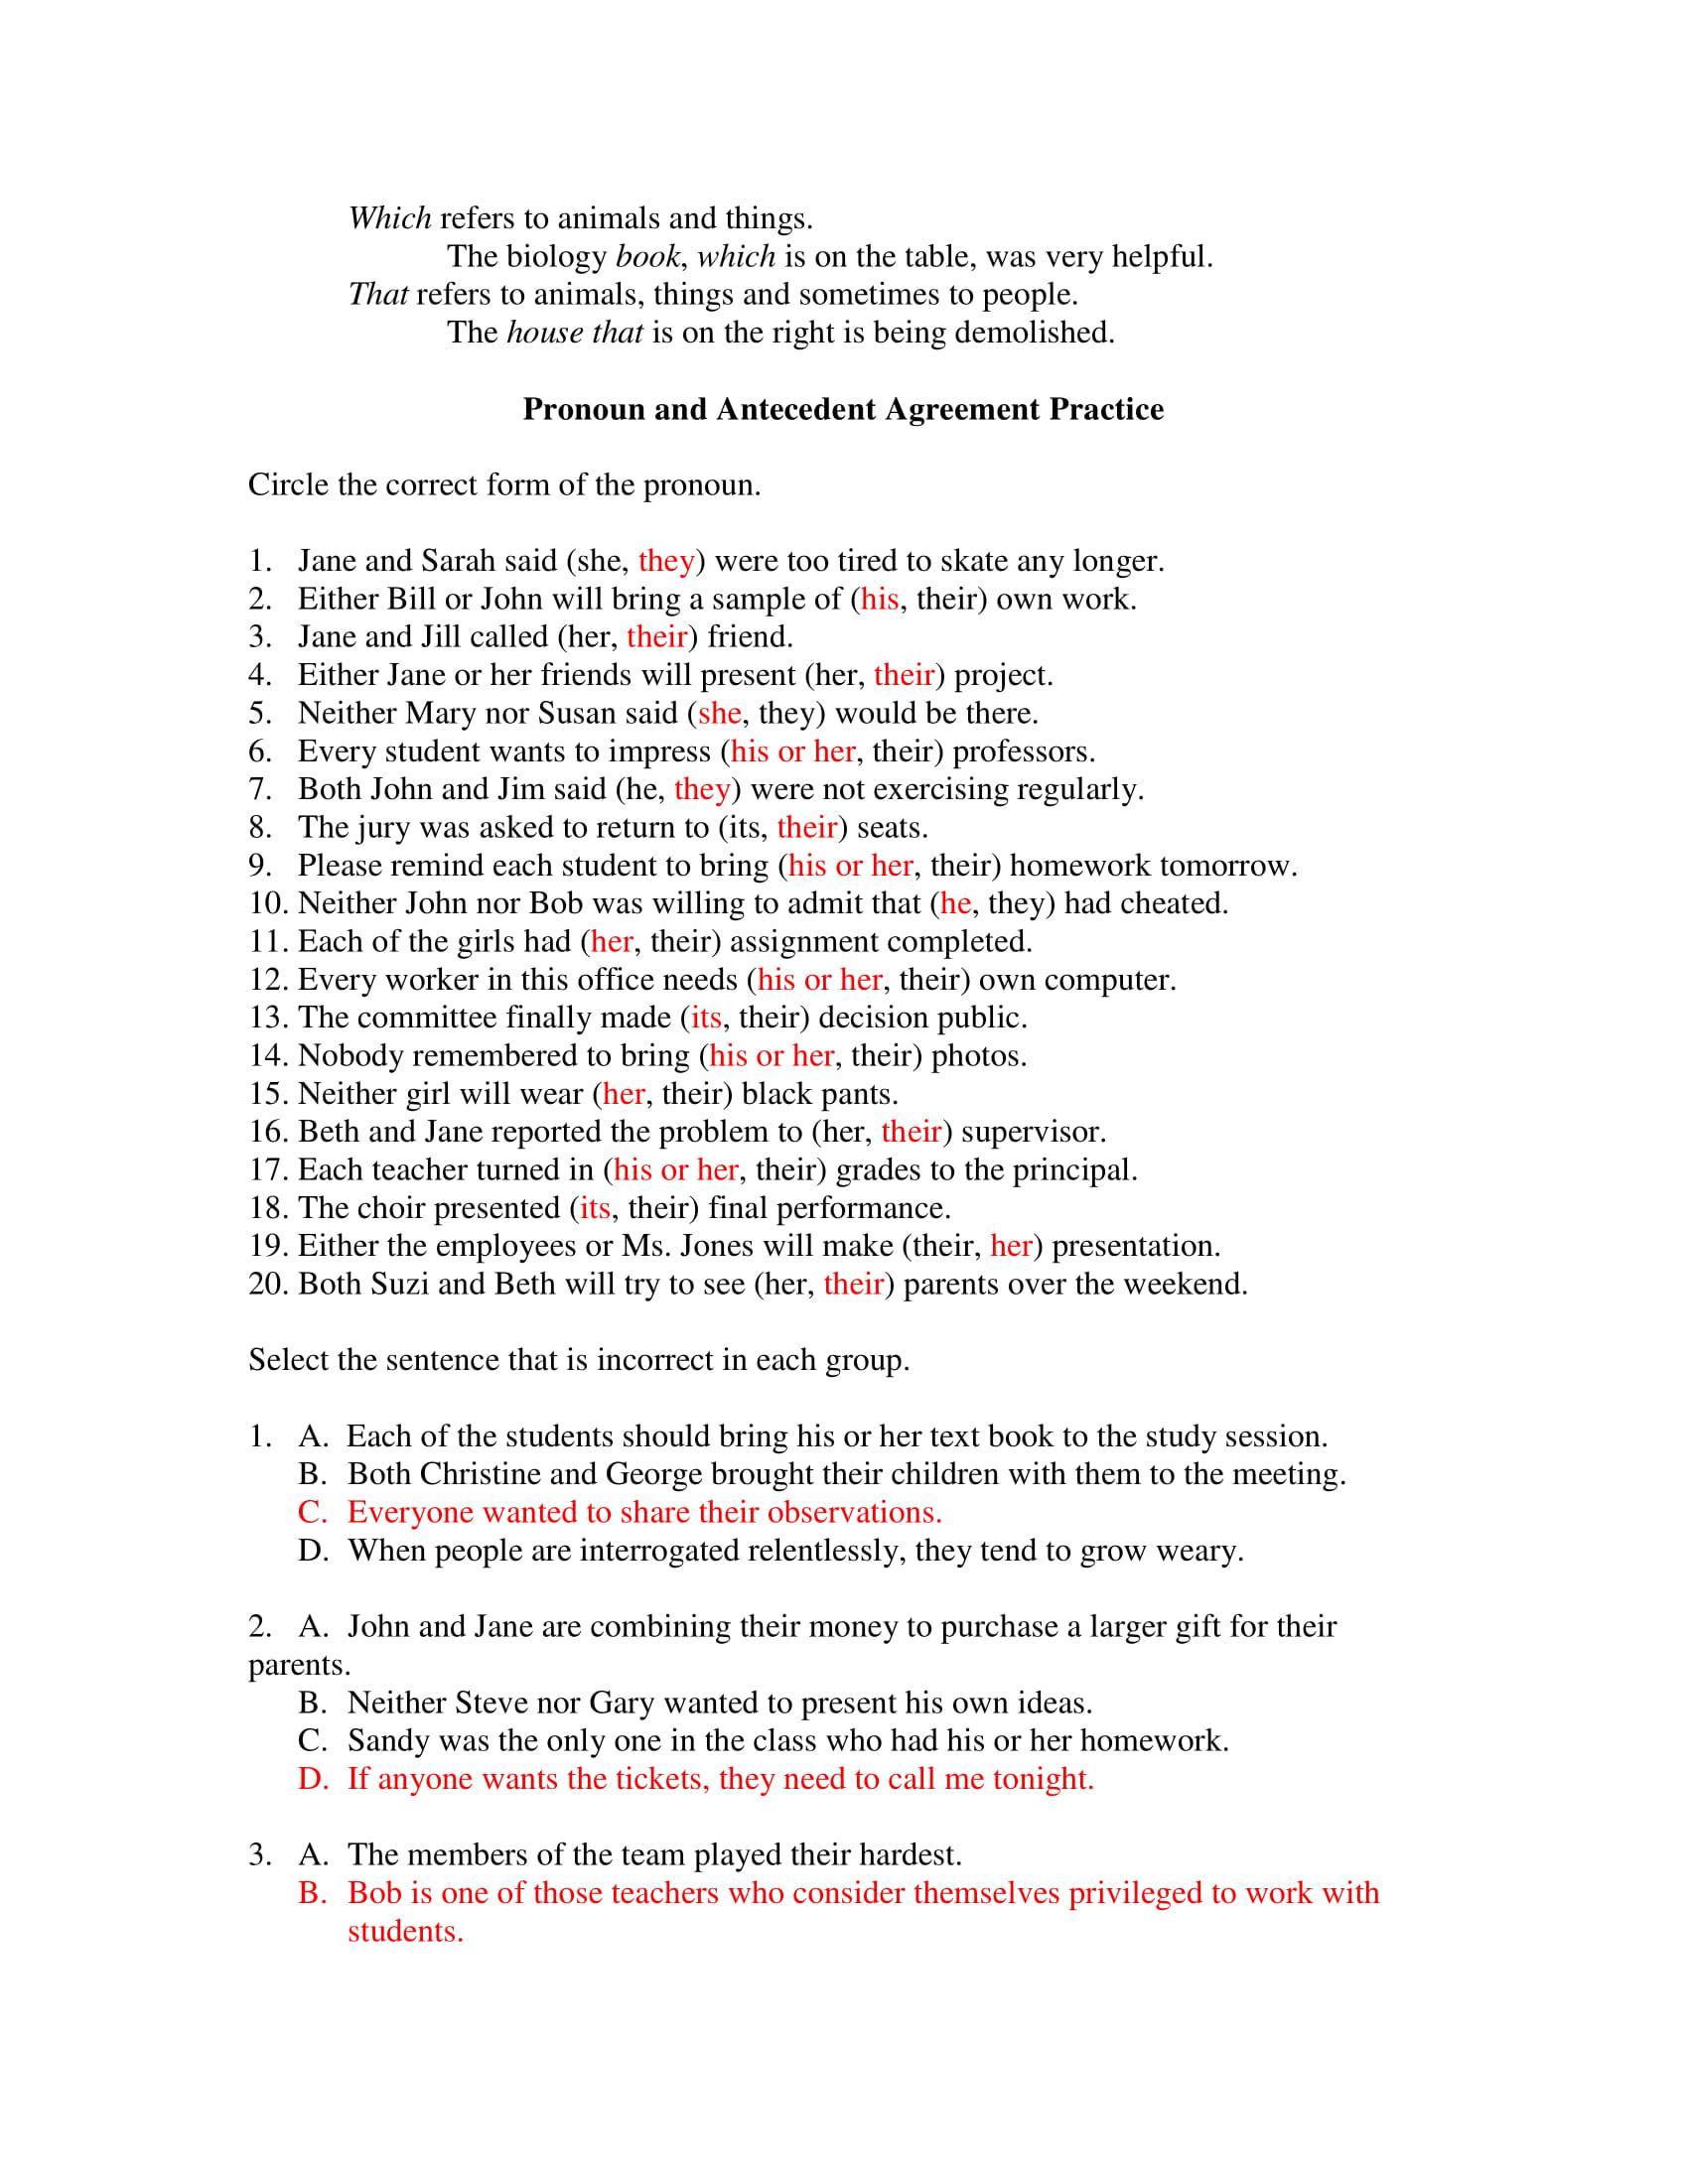 pronoun and antecedent agreement practice sheet example